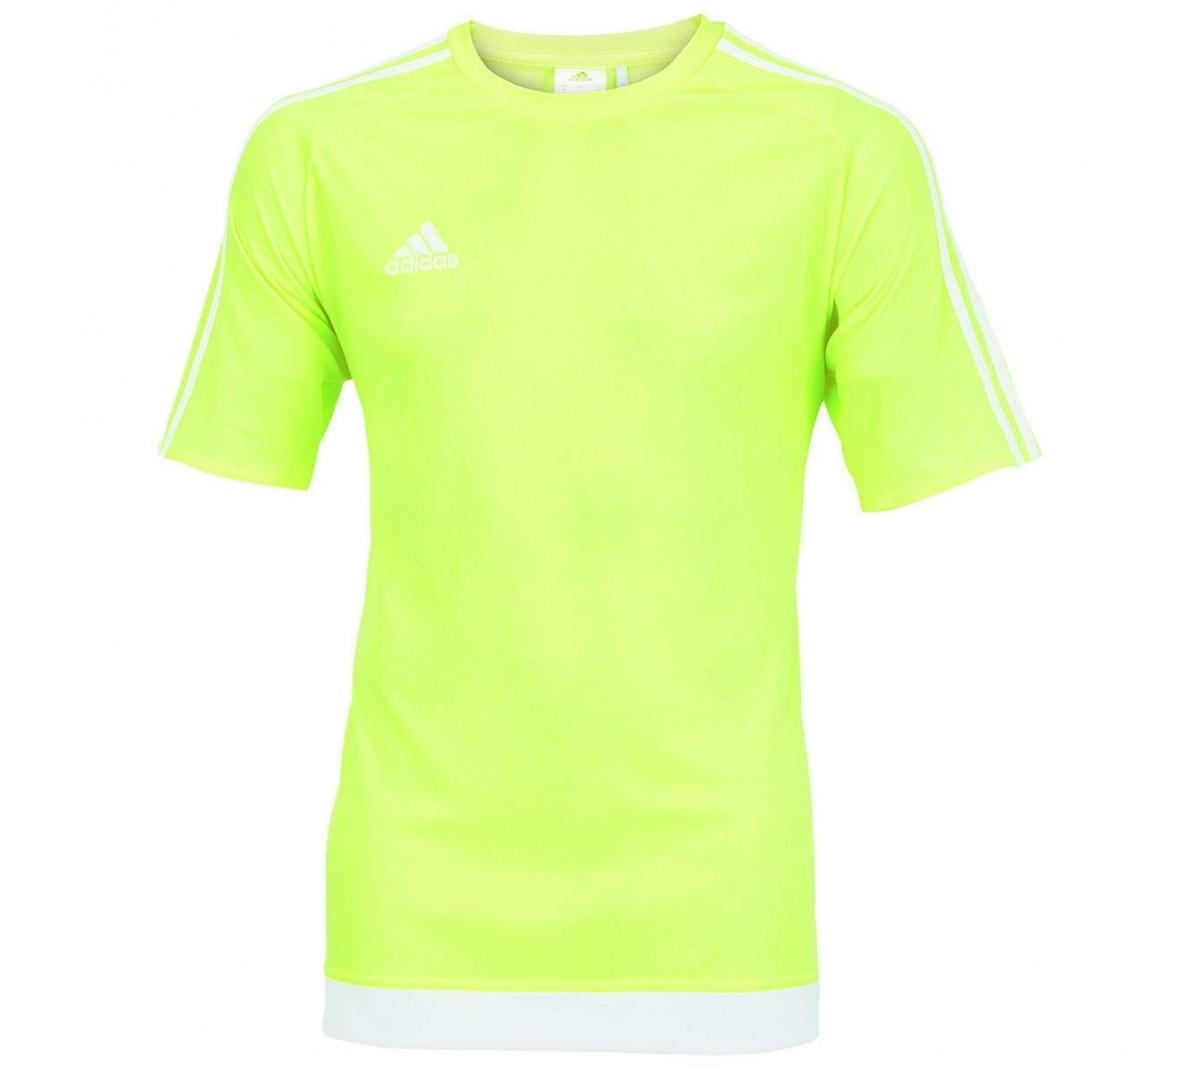 Camisa Adidas Estro 15 Branca Masculina Branco e Preto - Gaston ...  d68b487c35ce5b  Camisa Adidas Estro 15 Amarelo Camisa Adidas Estro 15  Amarelo . 690dba649cb9c